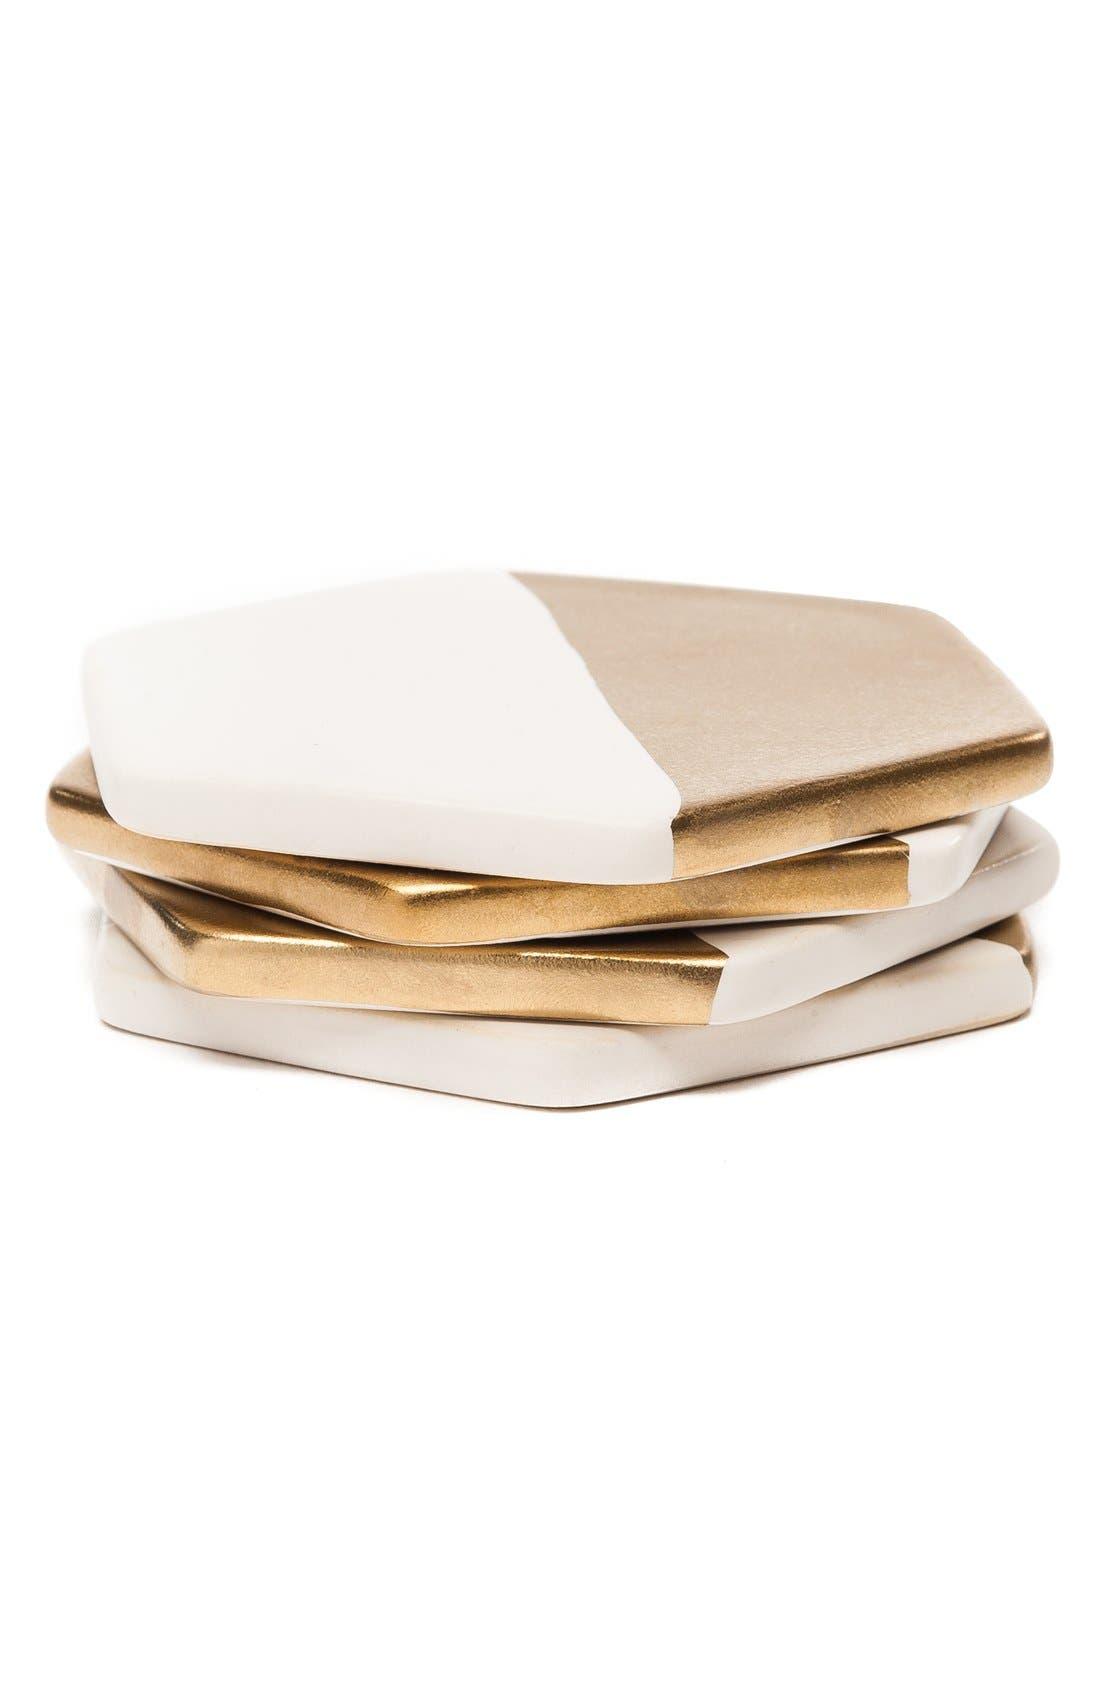 Alternate Image 1 Selected - zestt 'Hampton' Gilded Ceramic Coasters (Set of 4)